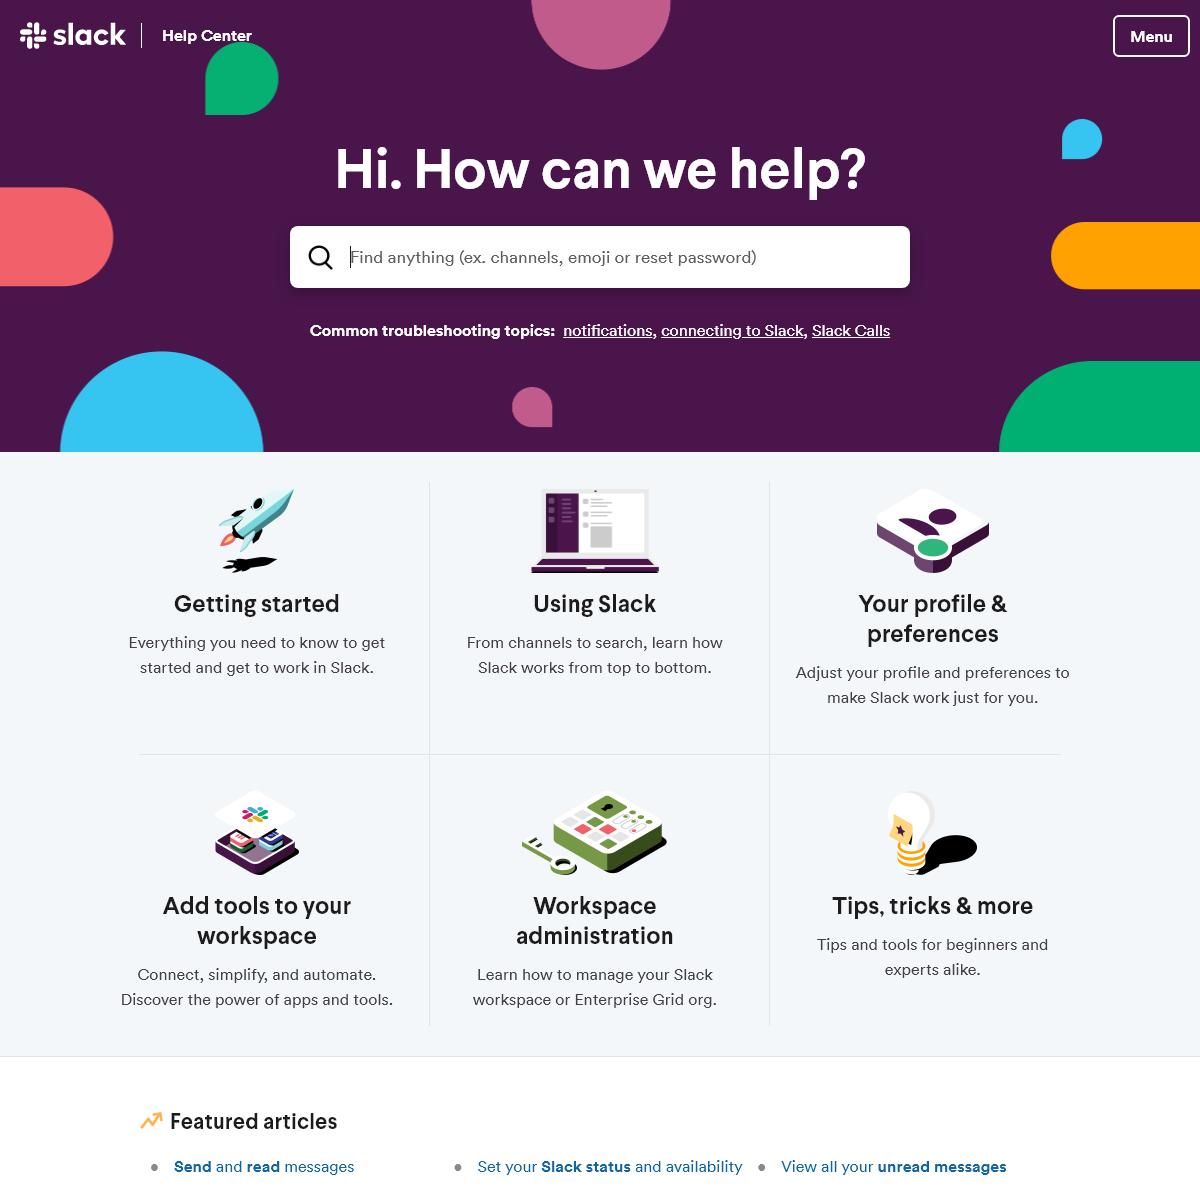 Slack Help Center - Slack